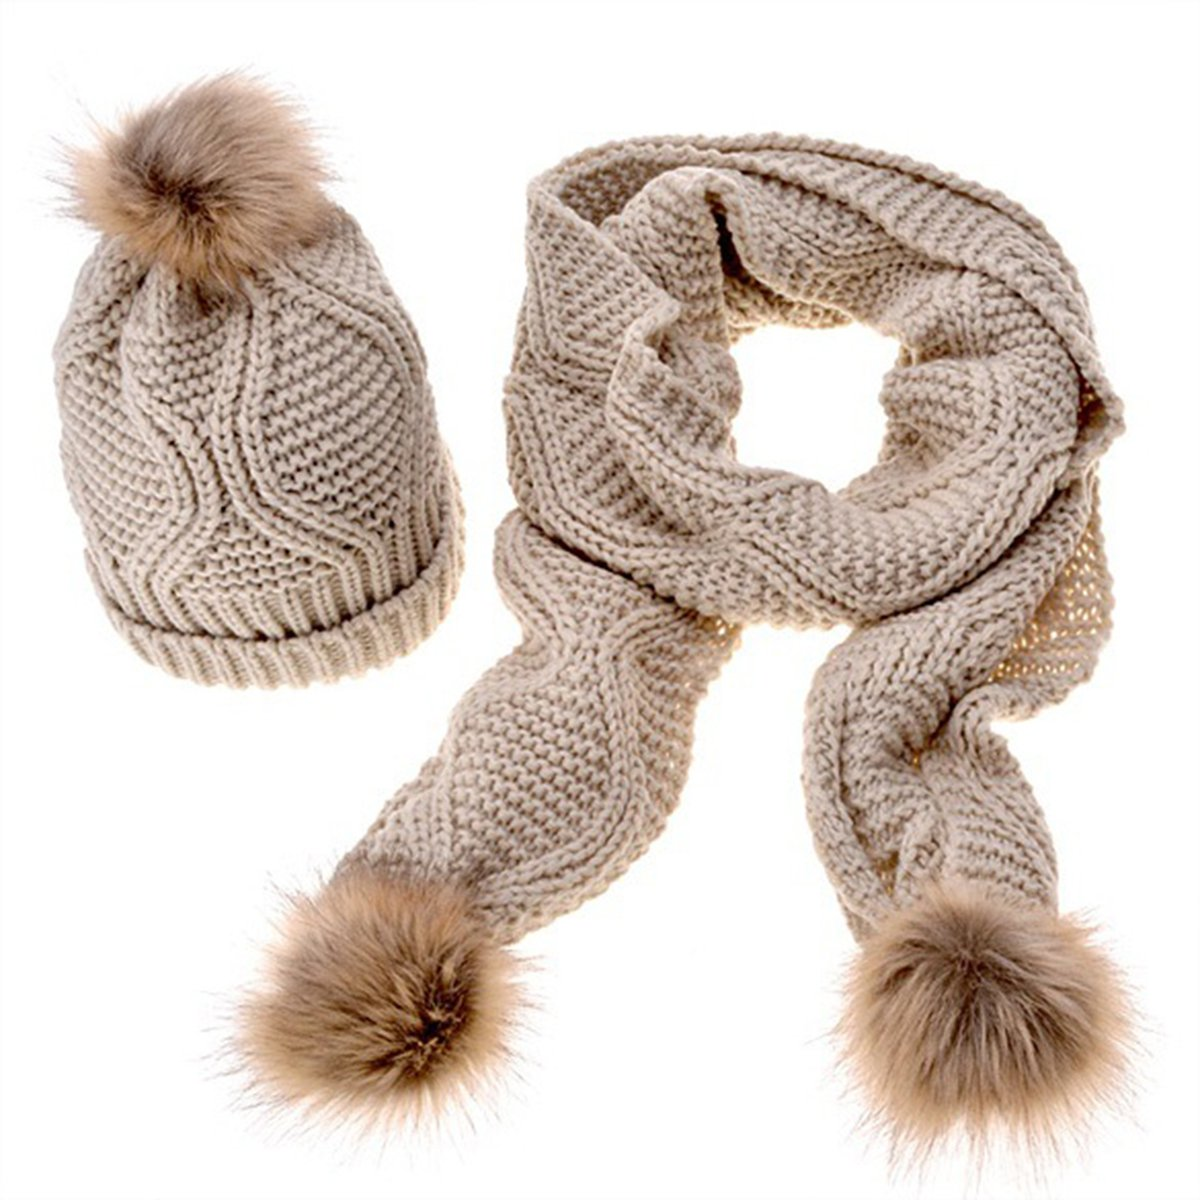 144196d73 MTTROLI Women's Sweater Hats Autumn Winter Warm Knitted Hat and Scarf Set